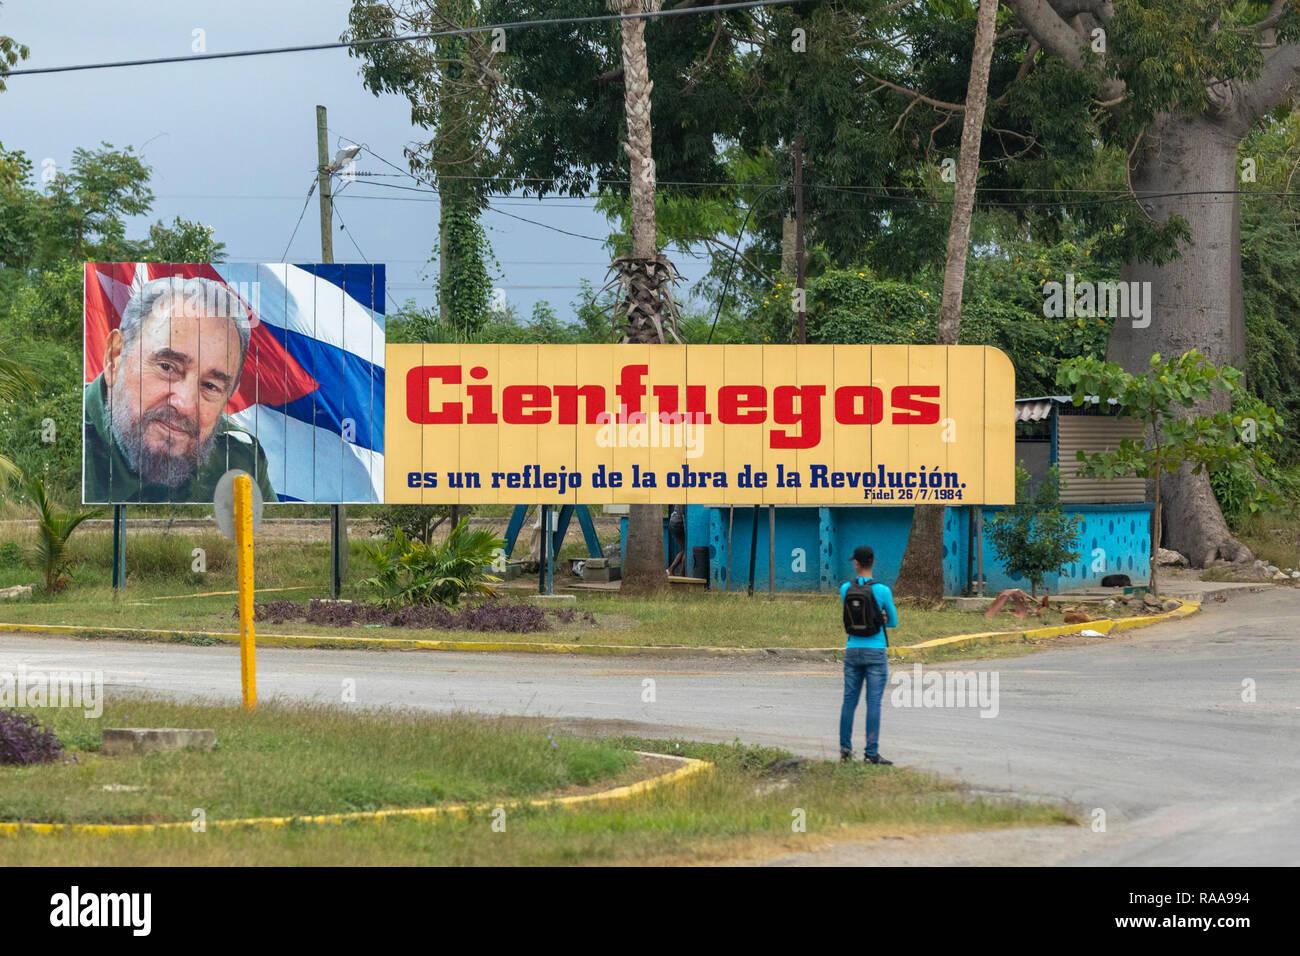 man waits for bus under Fidel Castro propaganda billboard - Stock Image